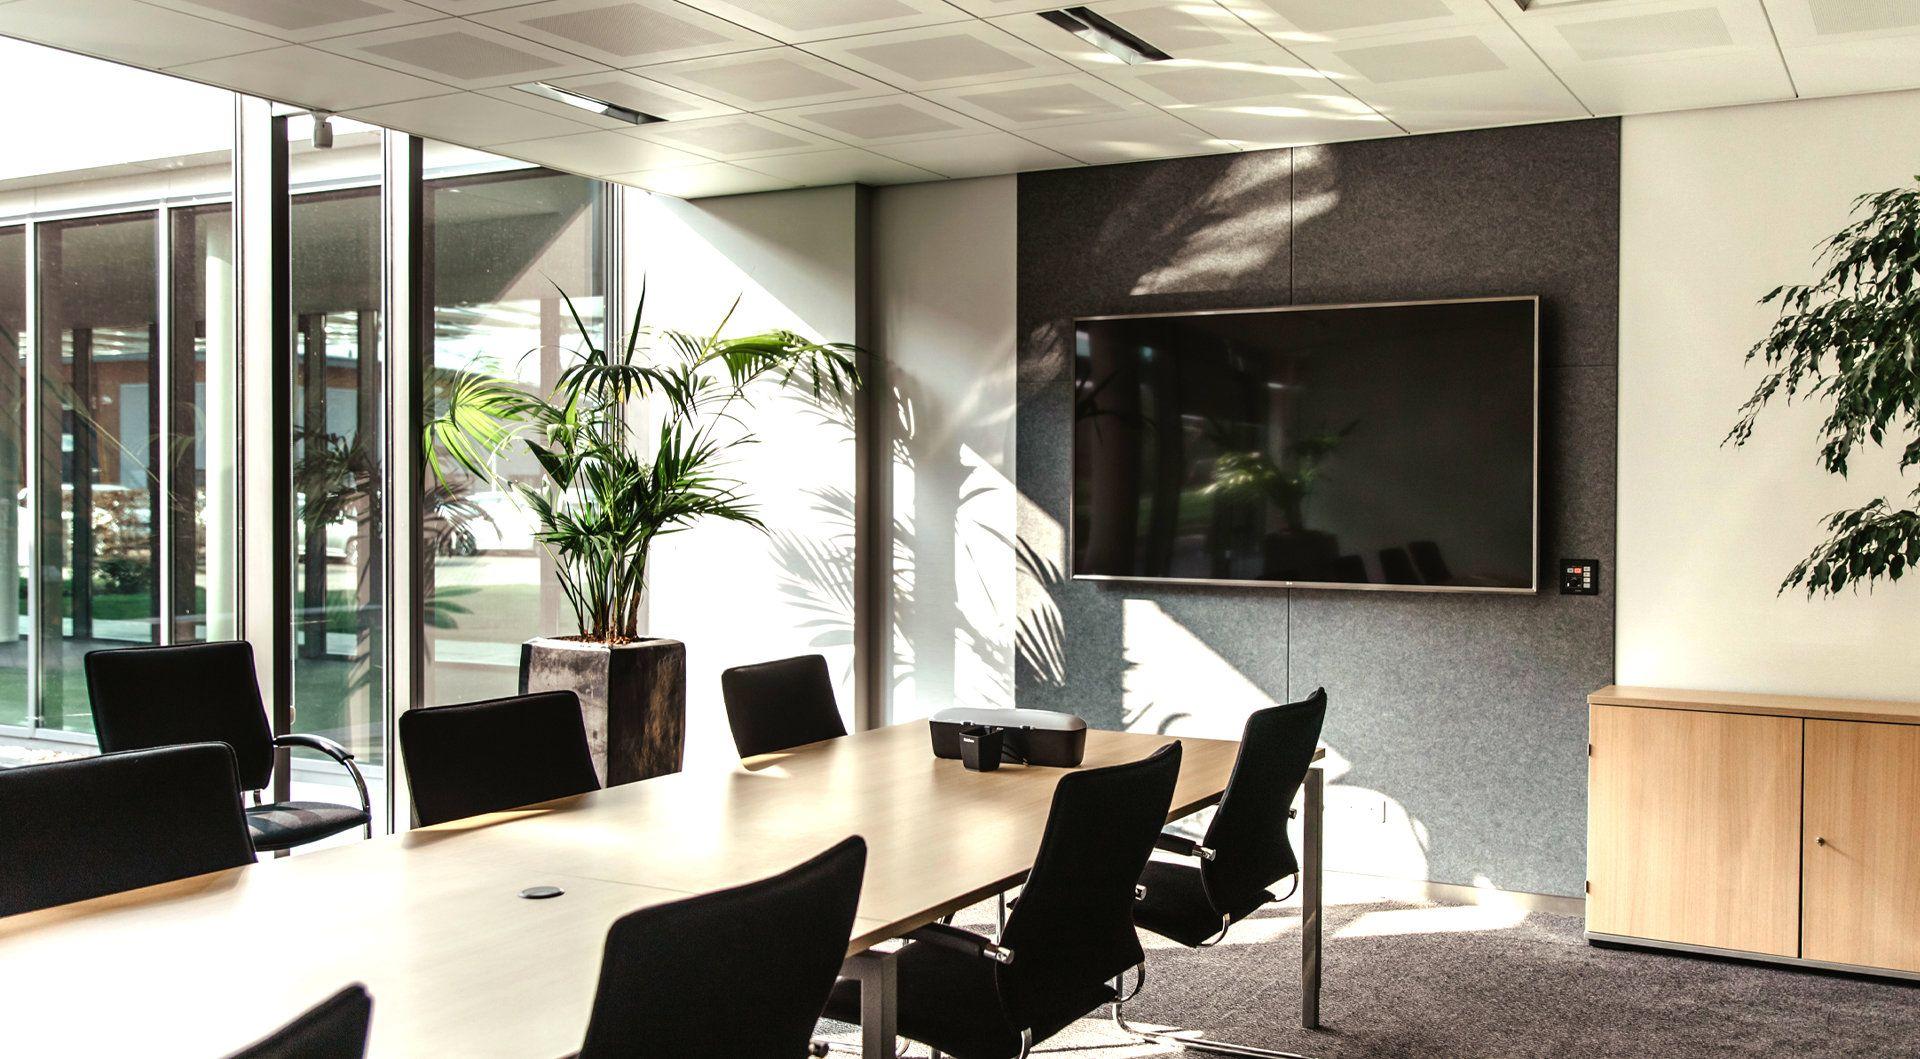 "LG 86UM3E beeldkrant 2,18 m (86"") LED 4K Ultra HD Digitale signage flatscreen Zwart - Case studie de vries"